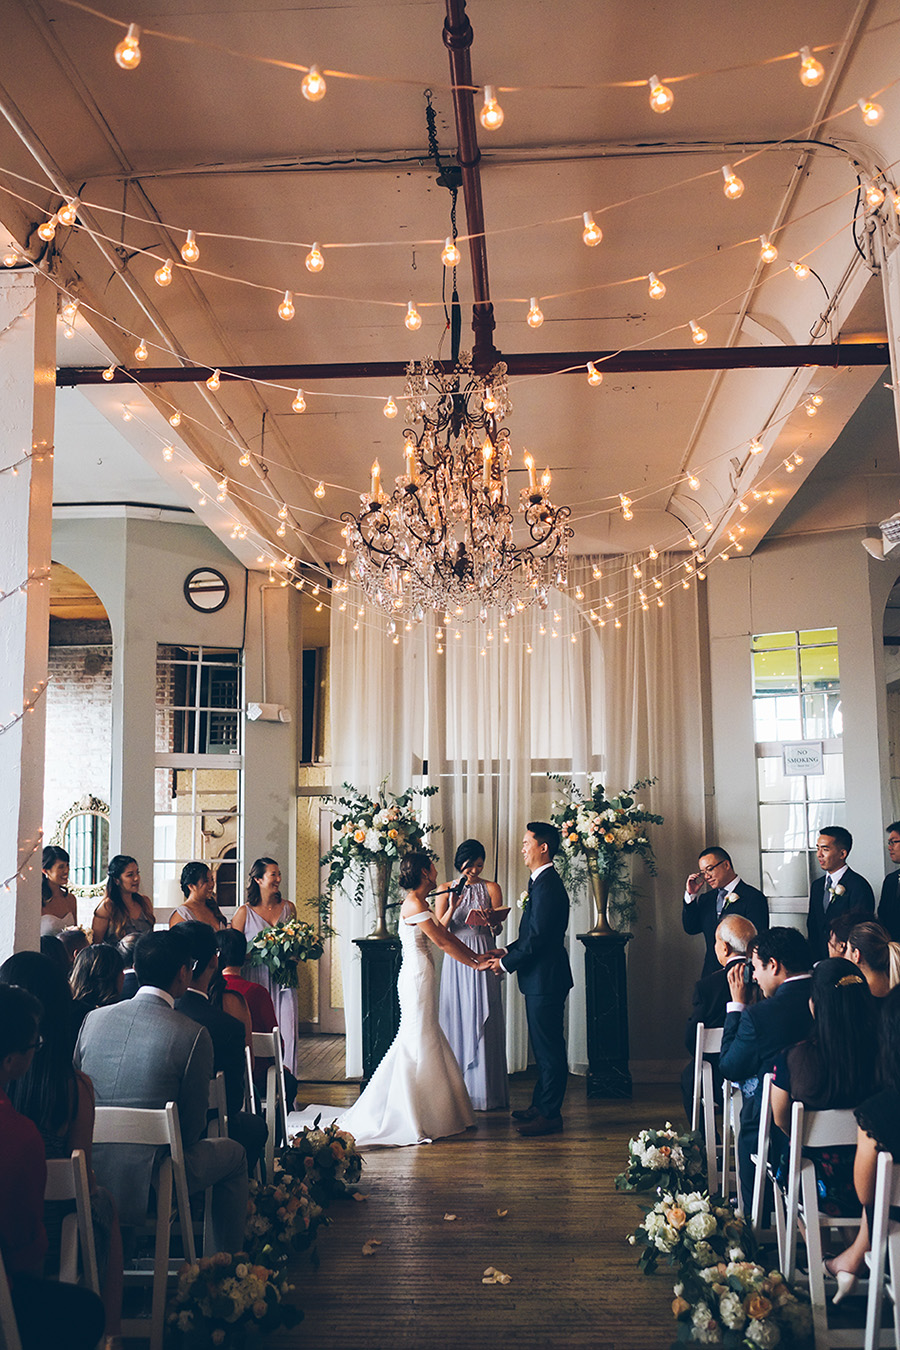 LIN-JOEY-NYC-WEDDING-METROPOLITANBUILDING-CEREMONY-CYNTHIACHUNG-0113.jpg